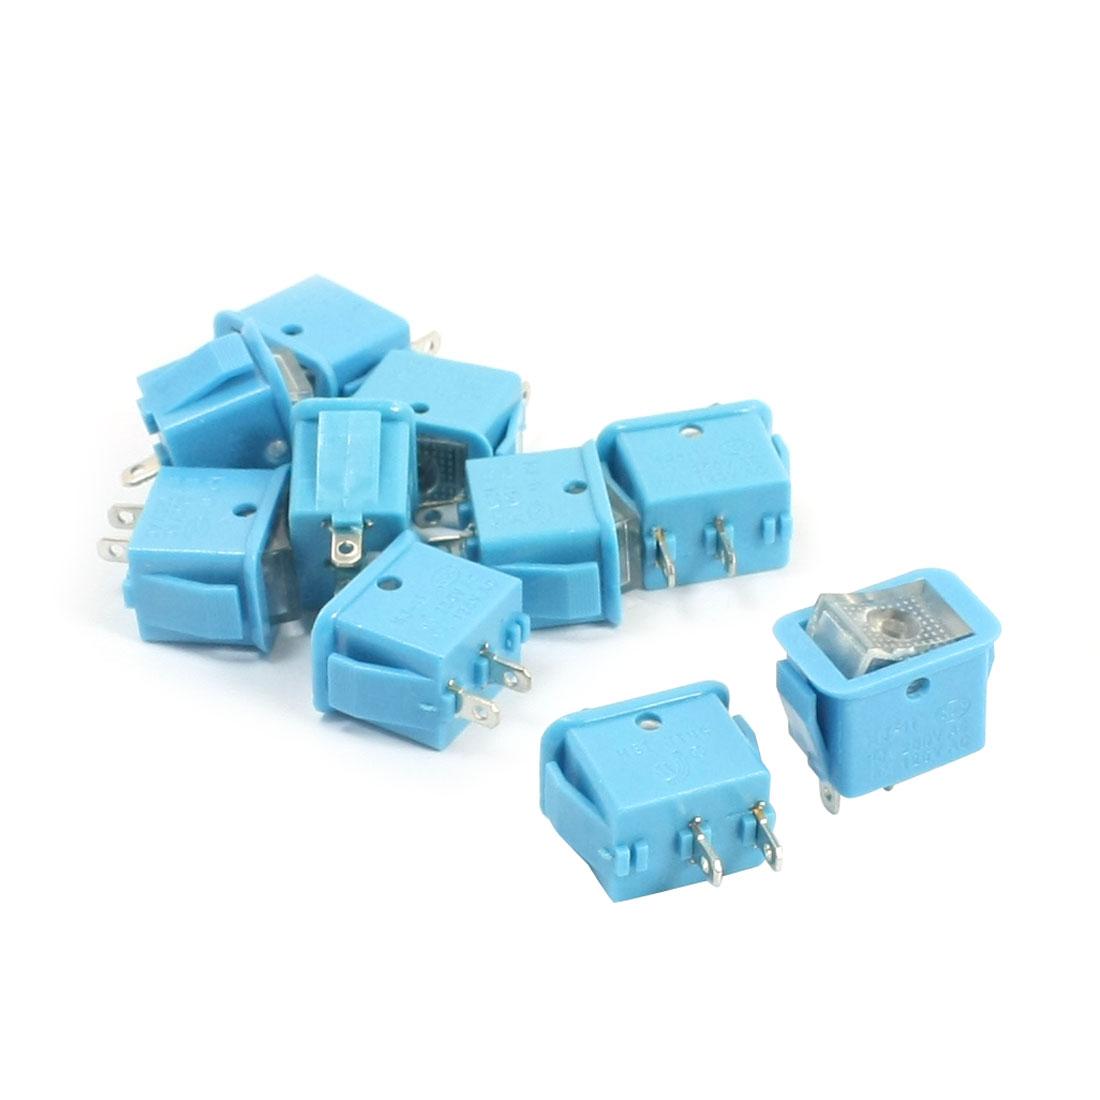 10Pcs AC250V/10A 125V/13A 2 Terminal Locking SPST On Off Rocker Switch